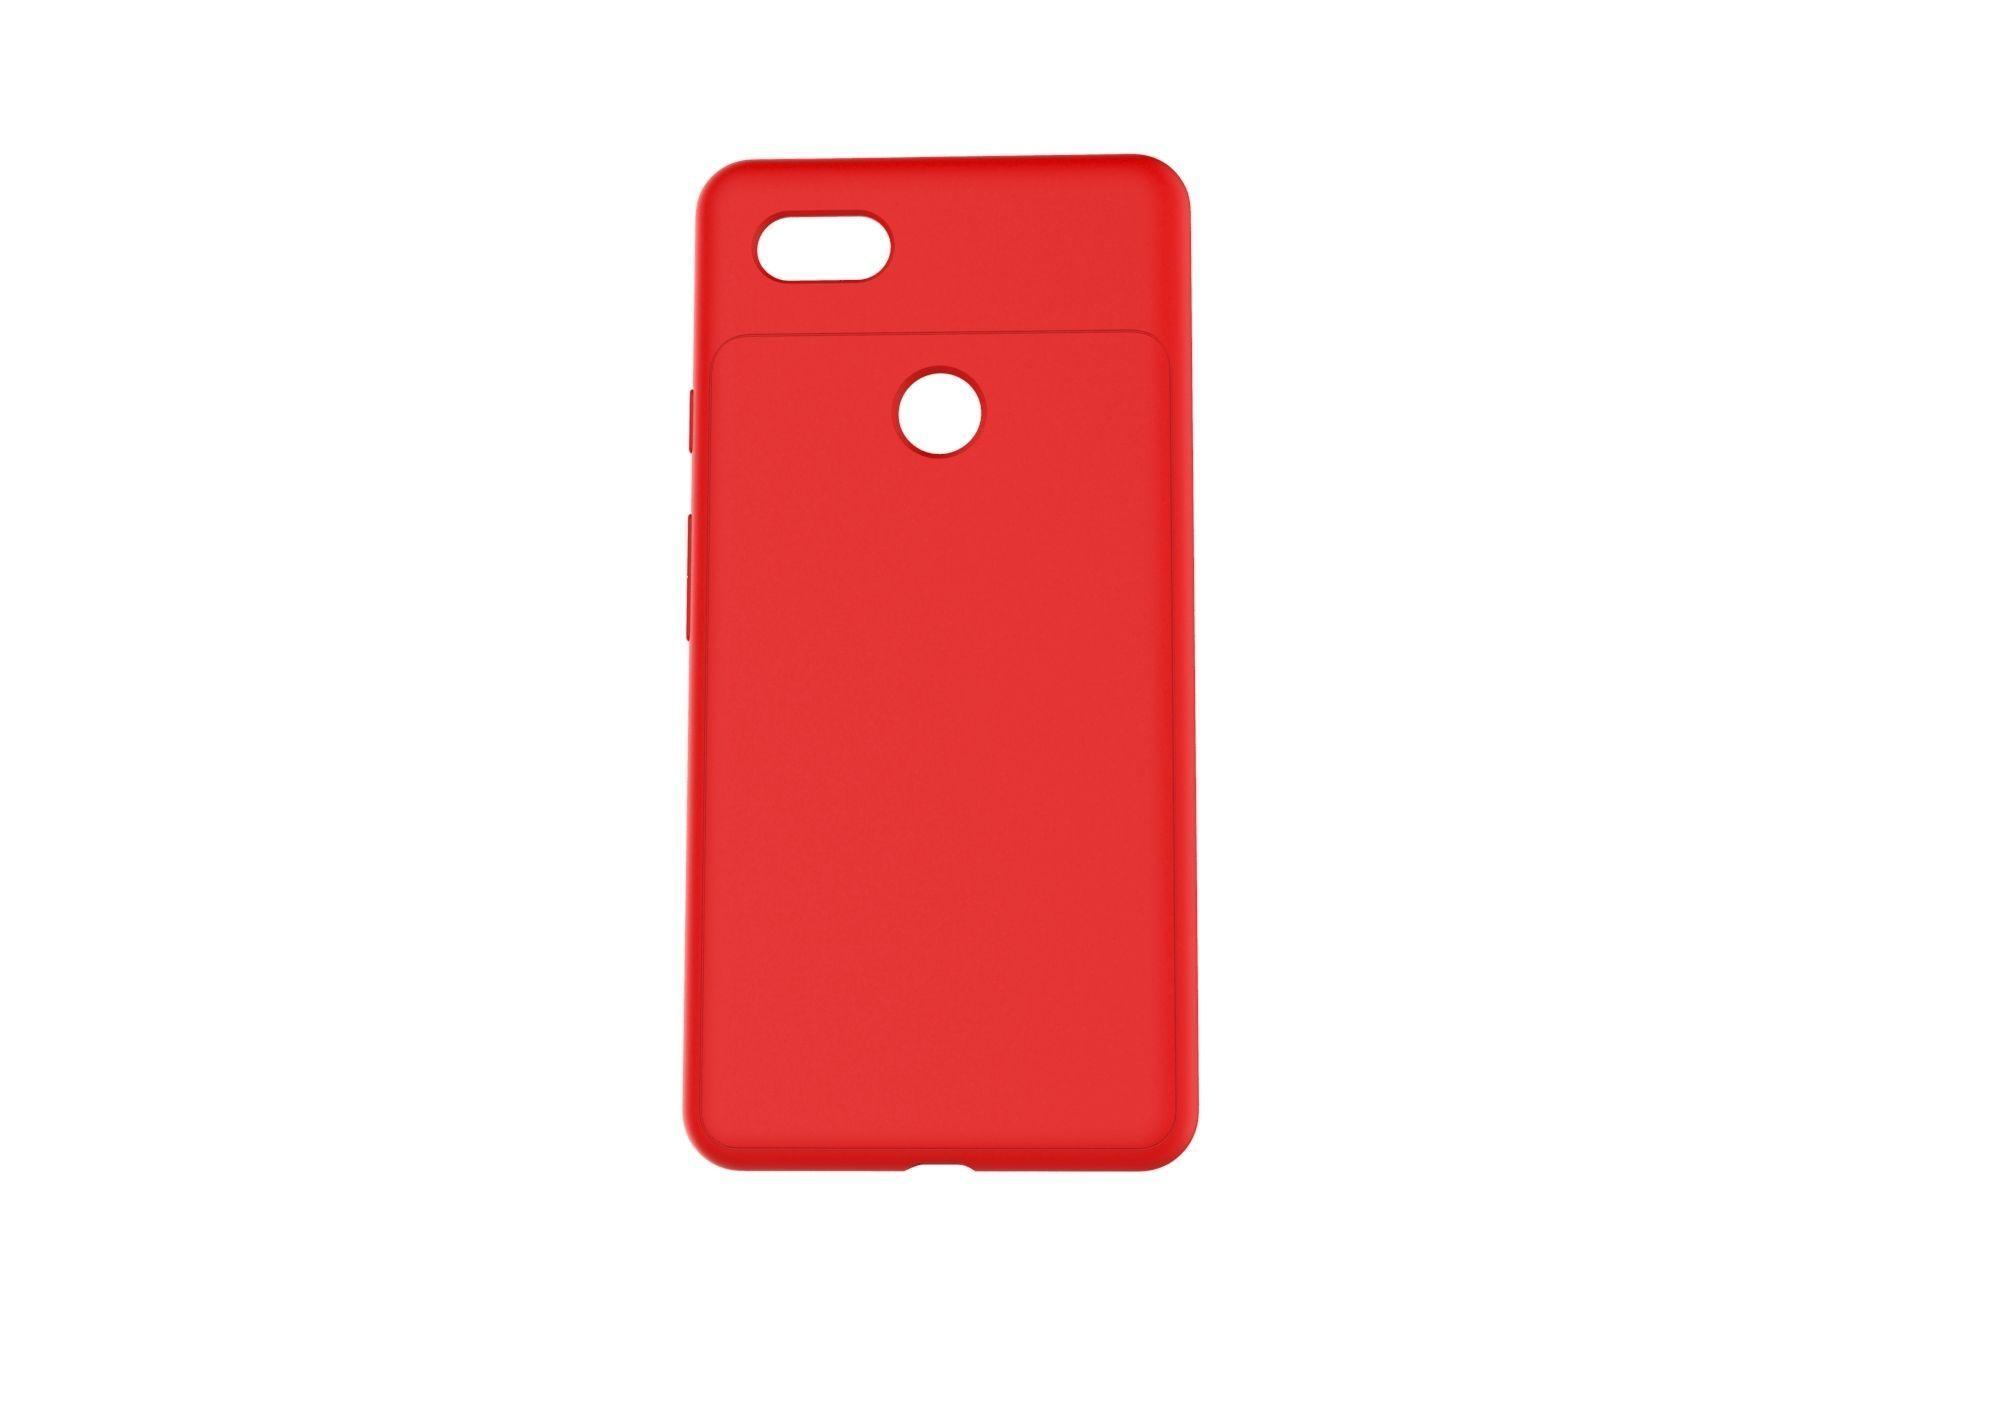 Google Pixel 3xl red case customizable design